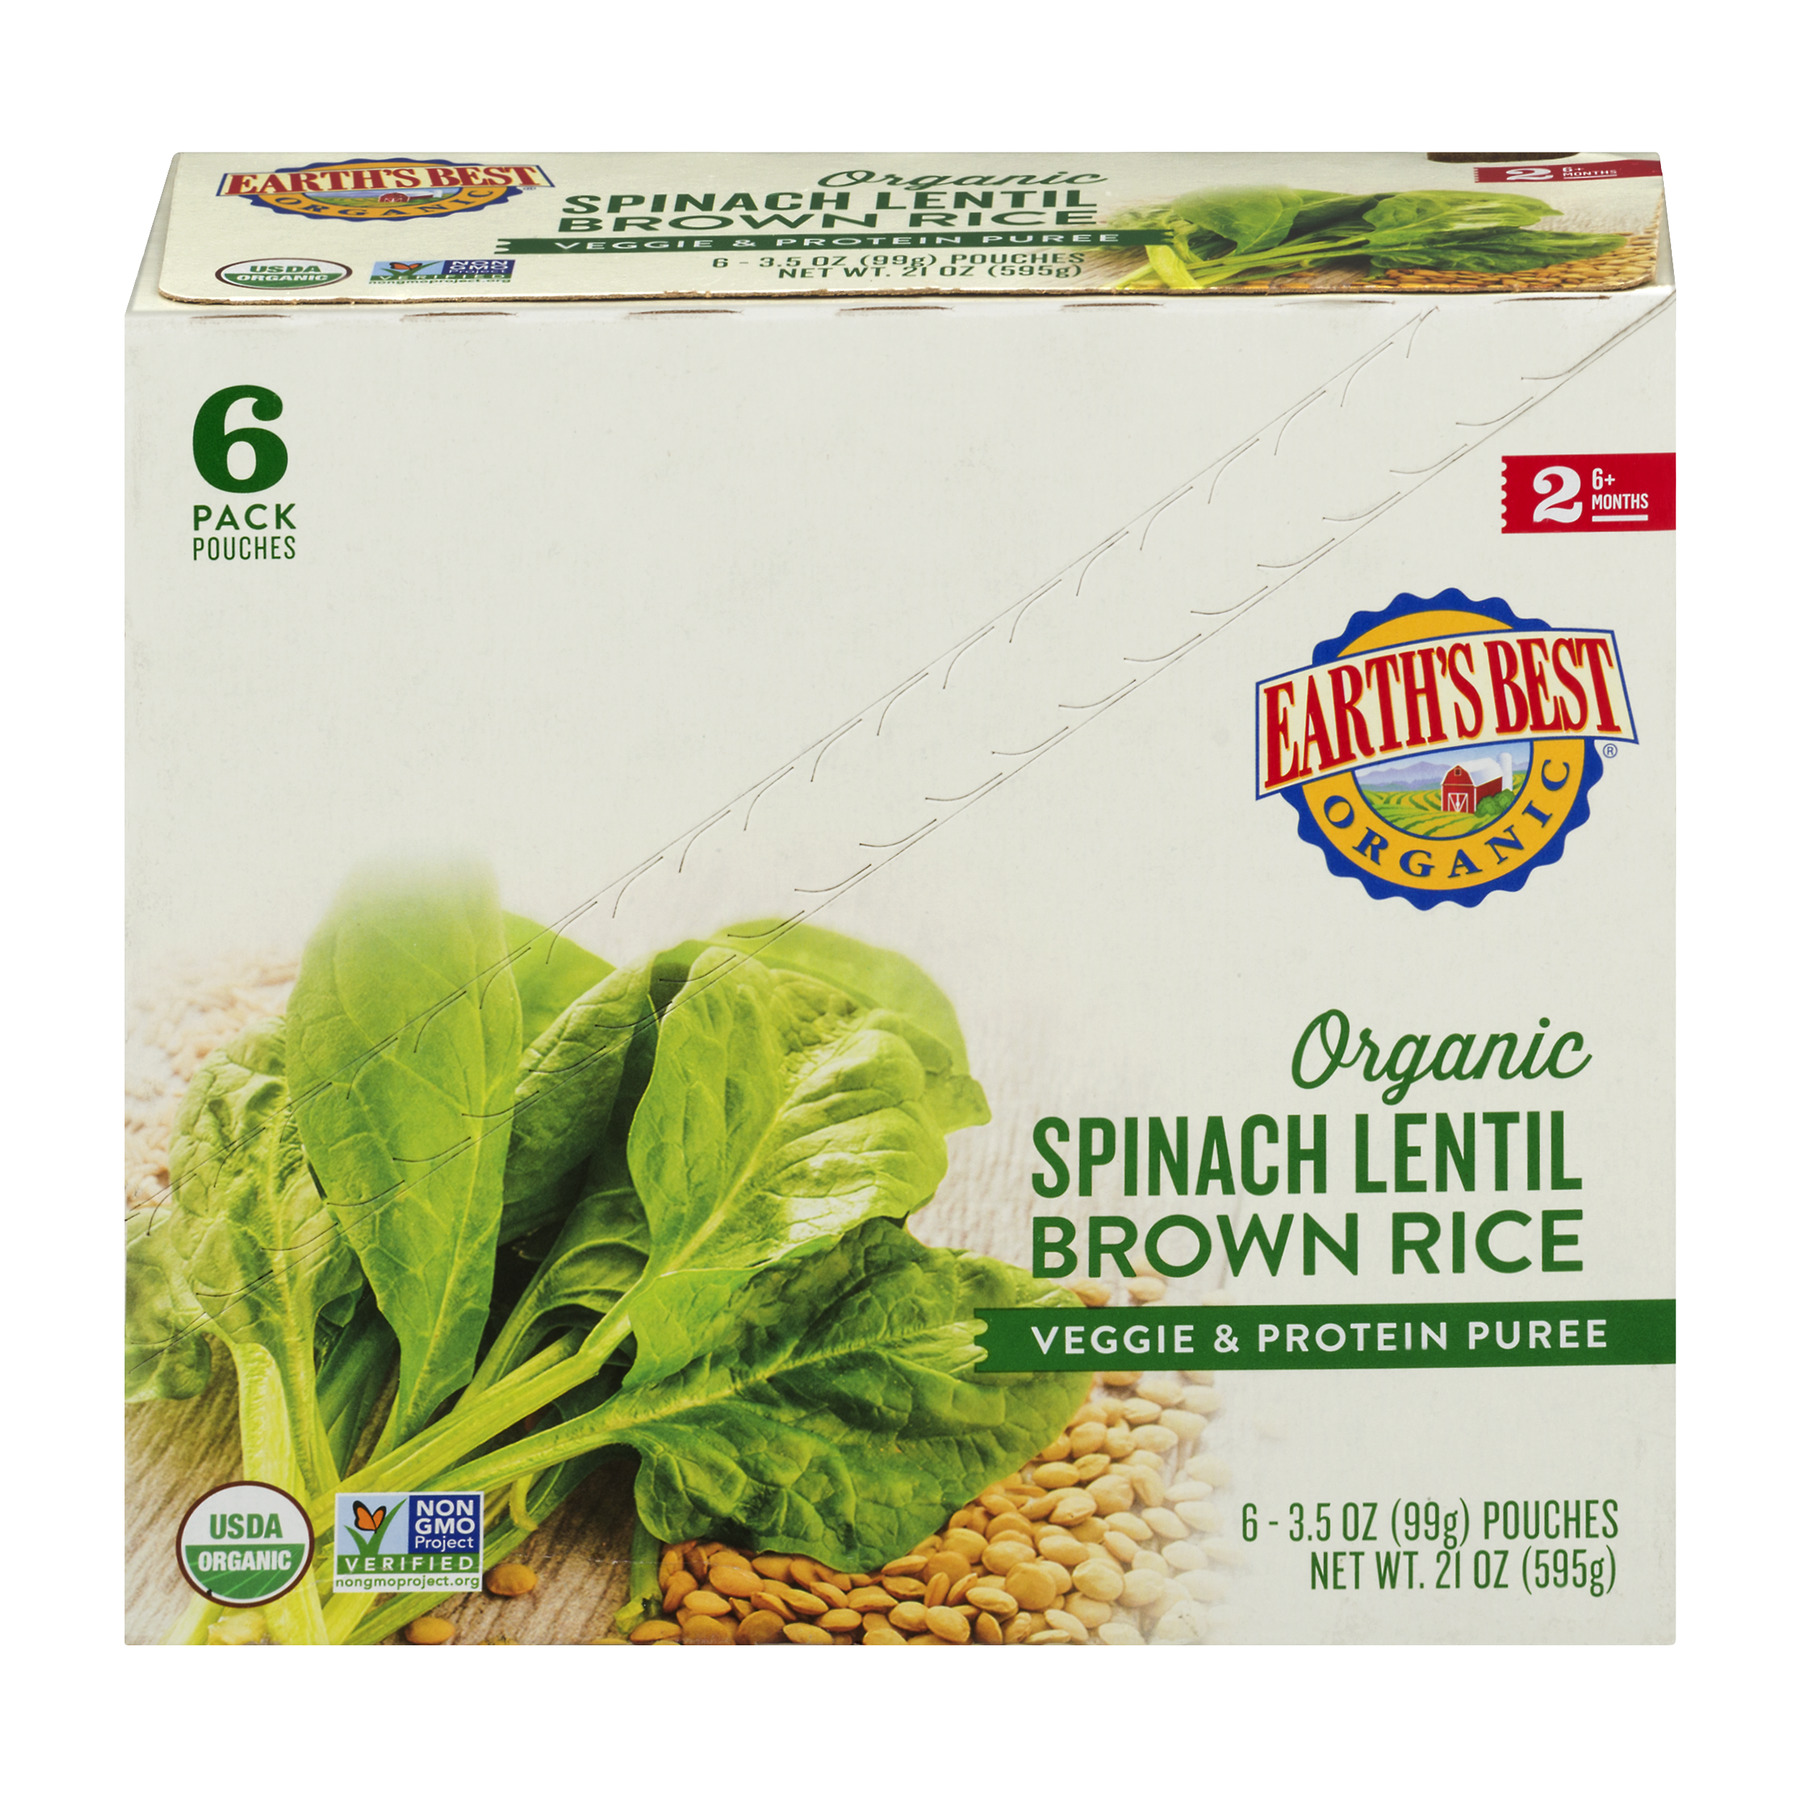 Earth's Best Organic Spinach Lentil Brown Rice Veggie & Protein Puree 6+ Months - 6 PK, 3.5 OZ